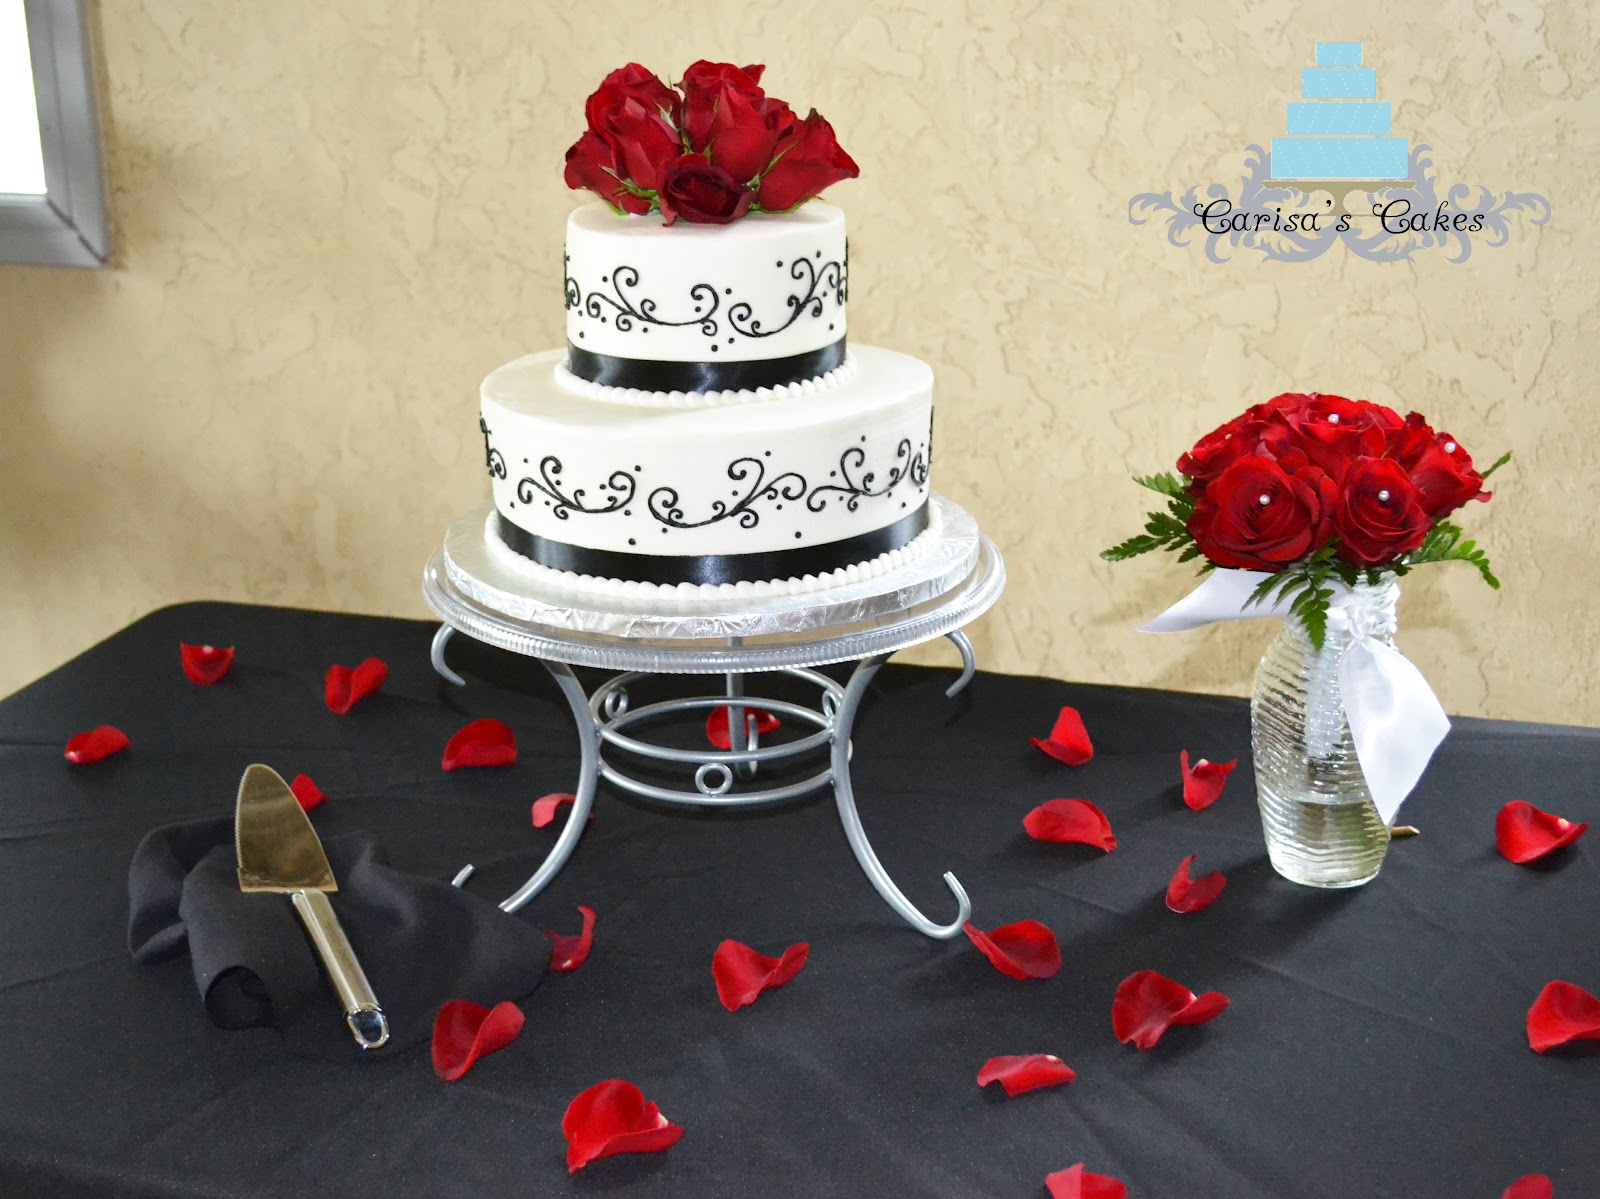 Carisa s Cakes Black and White Wedding Cake